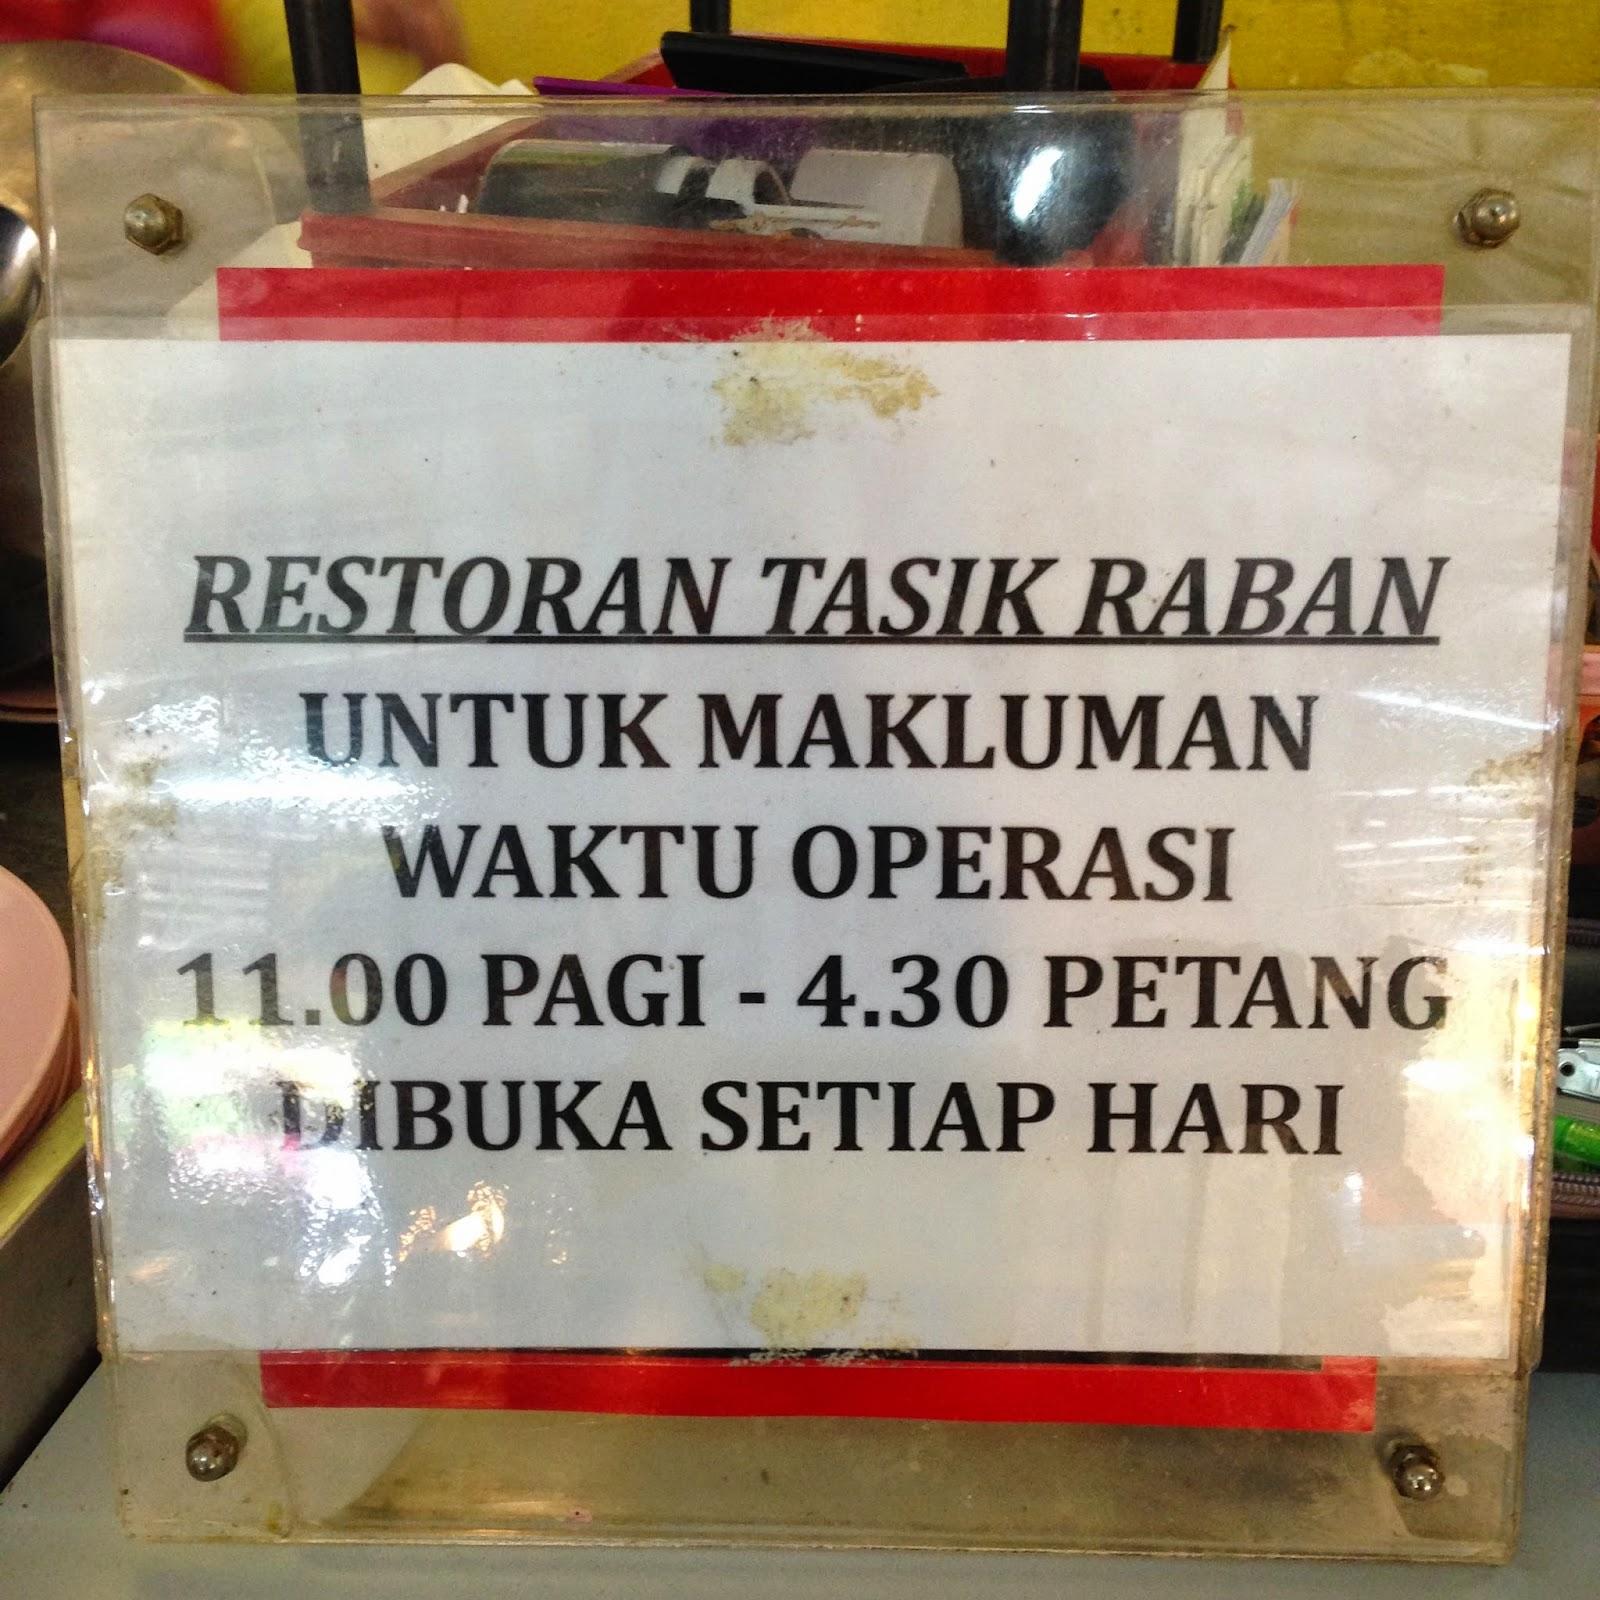 Restoran Tasik Raban